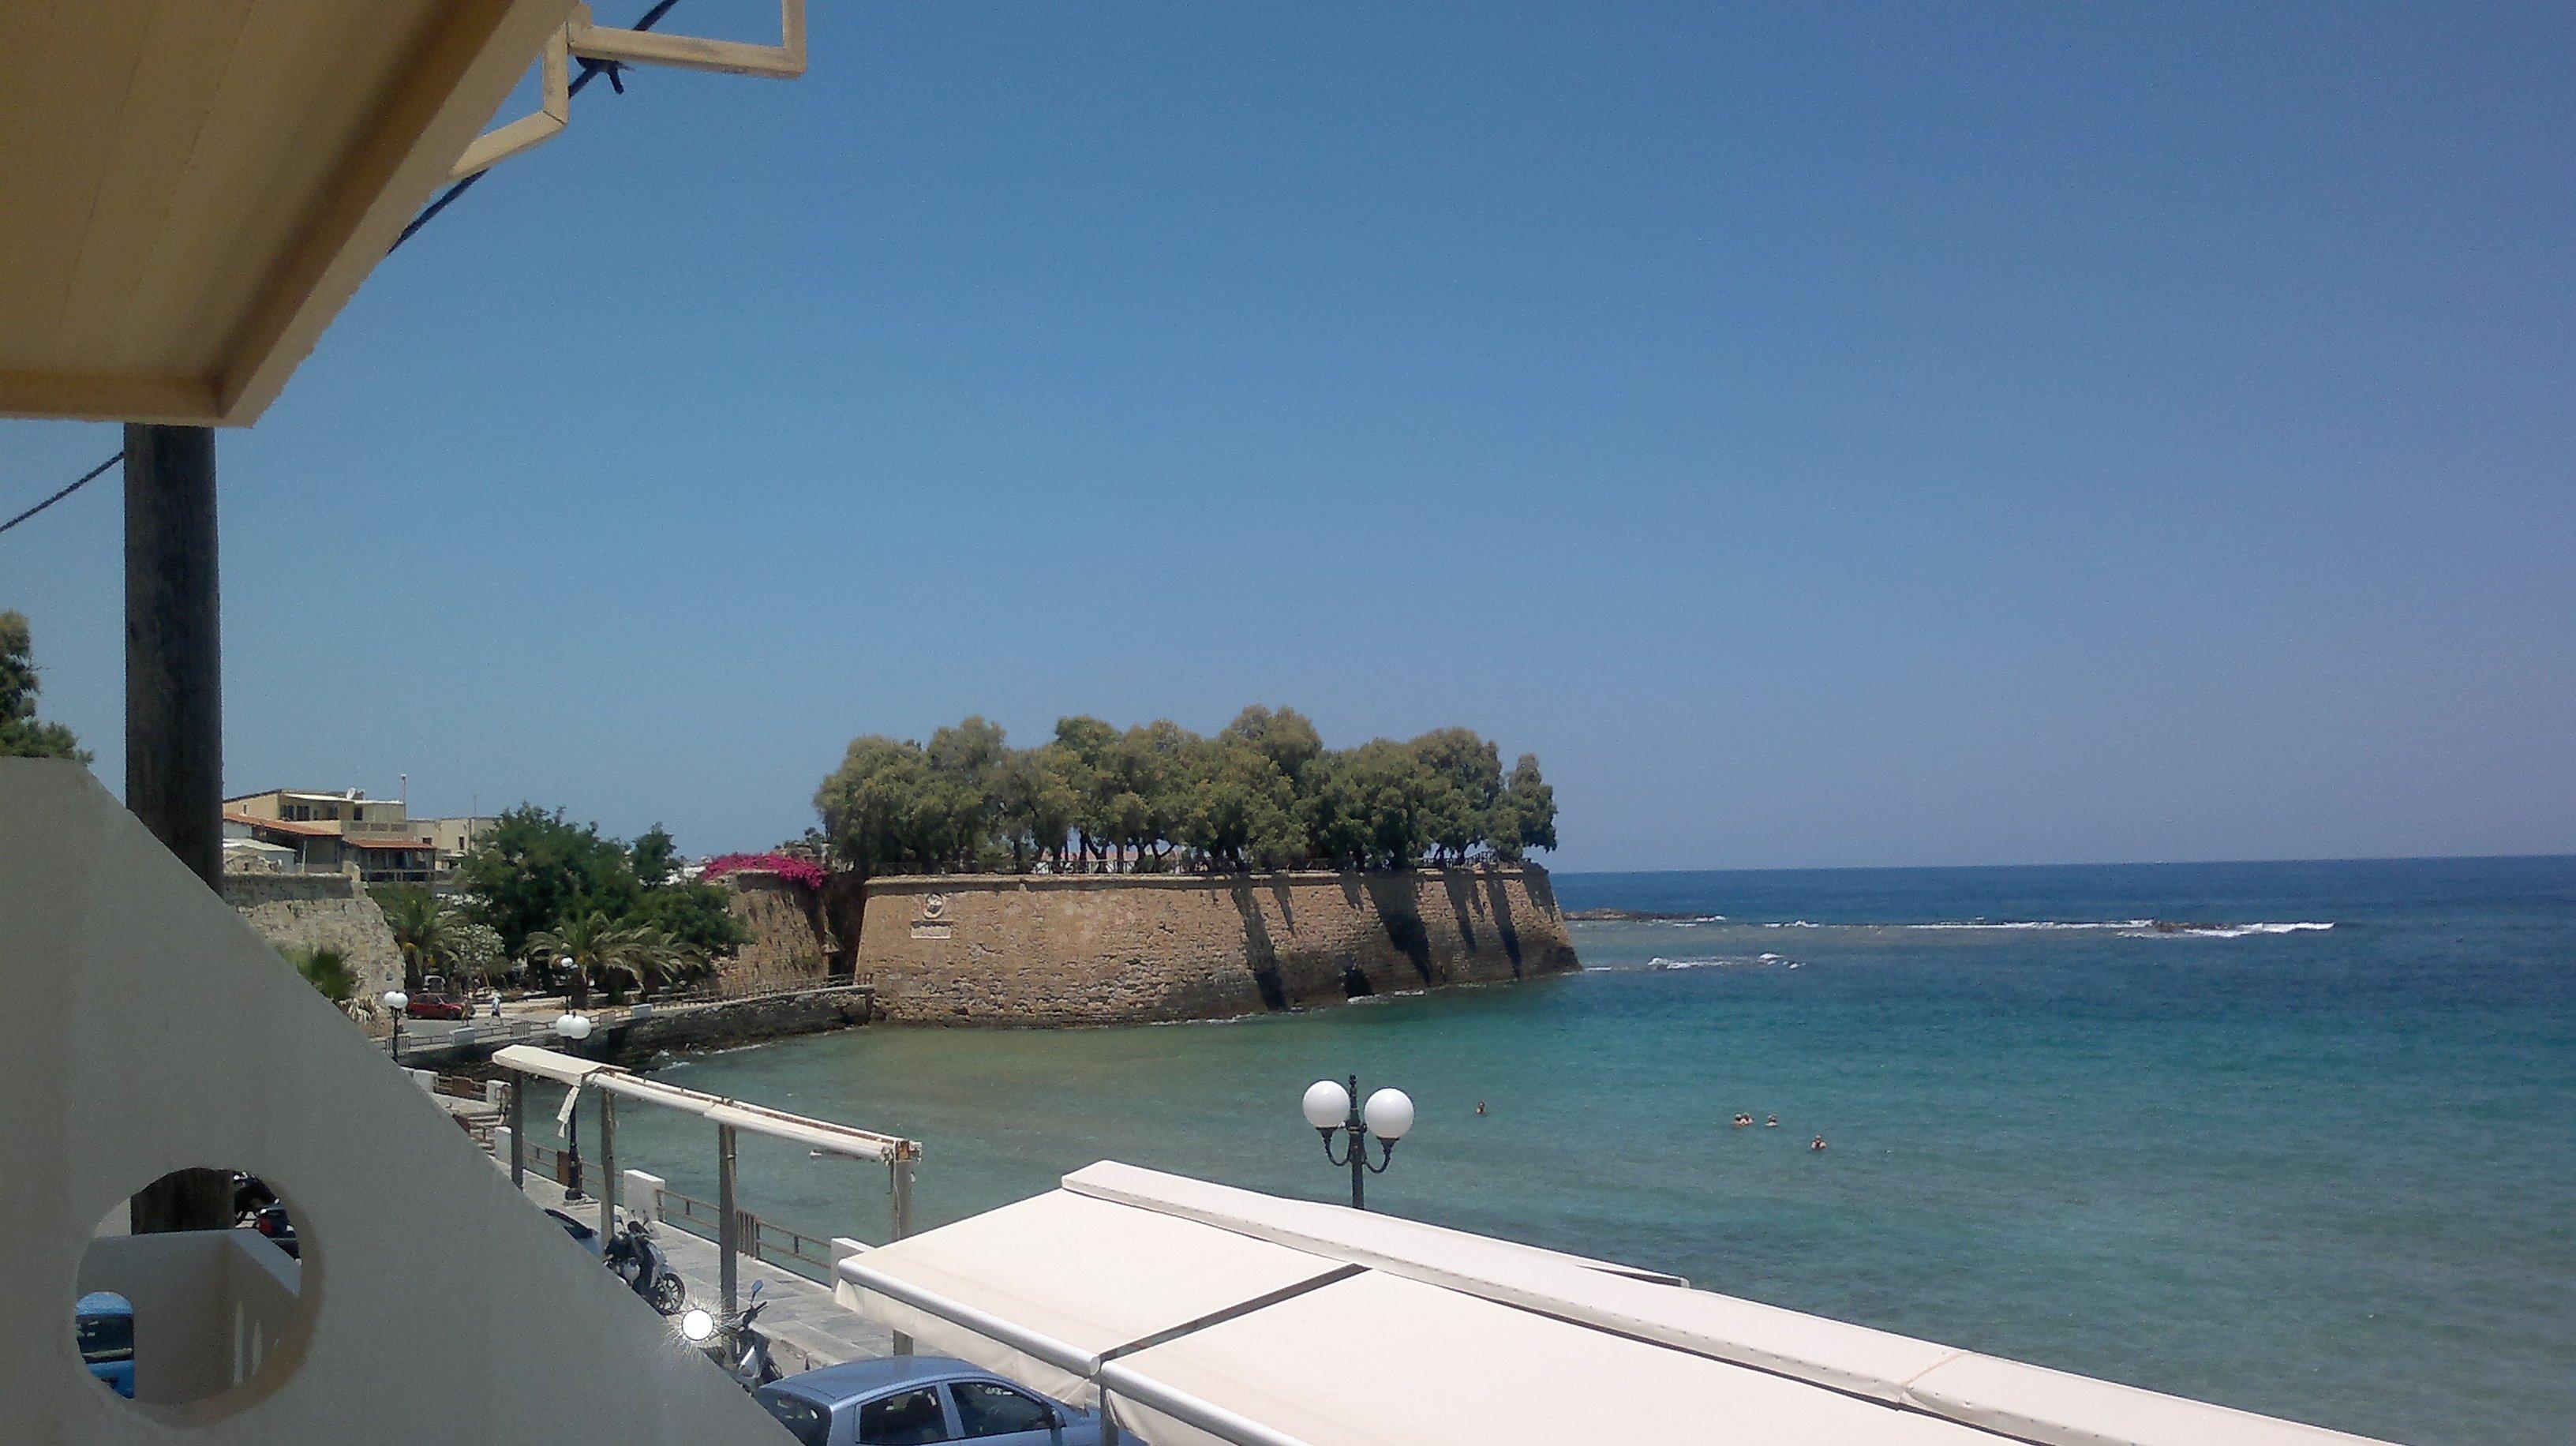 Argo Beach / Cretan sea / Balcony / Chania, Crete.